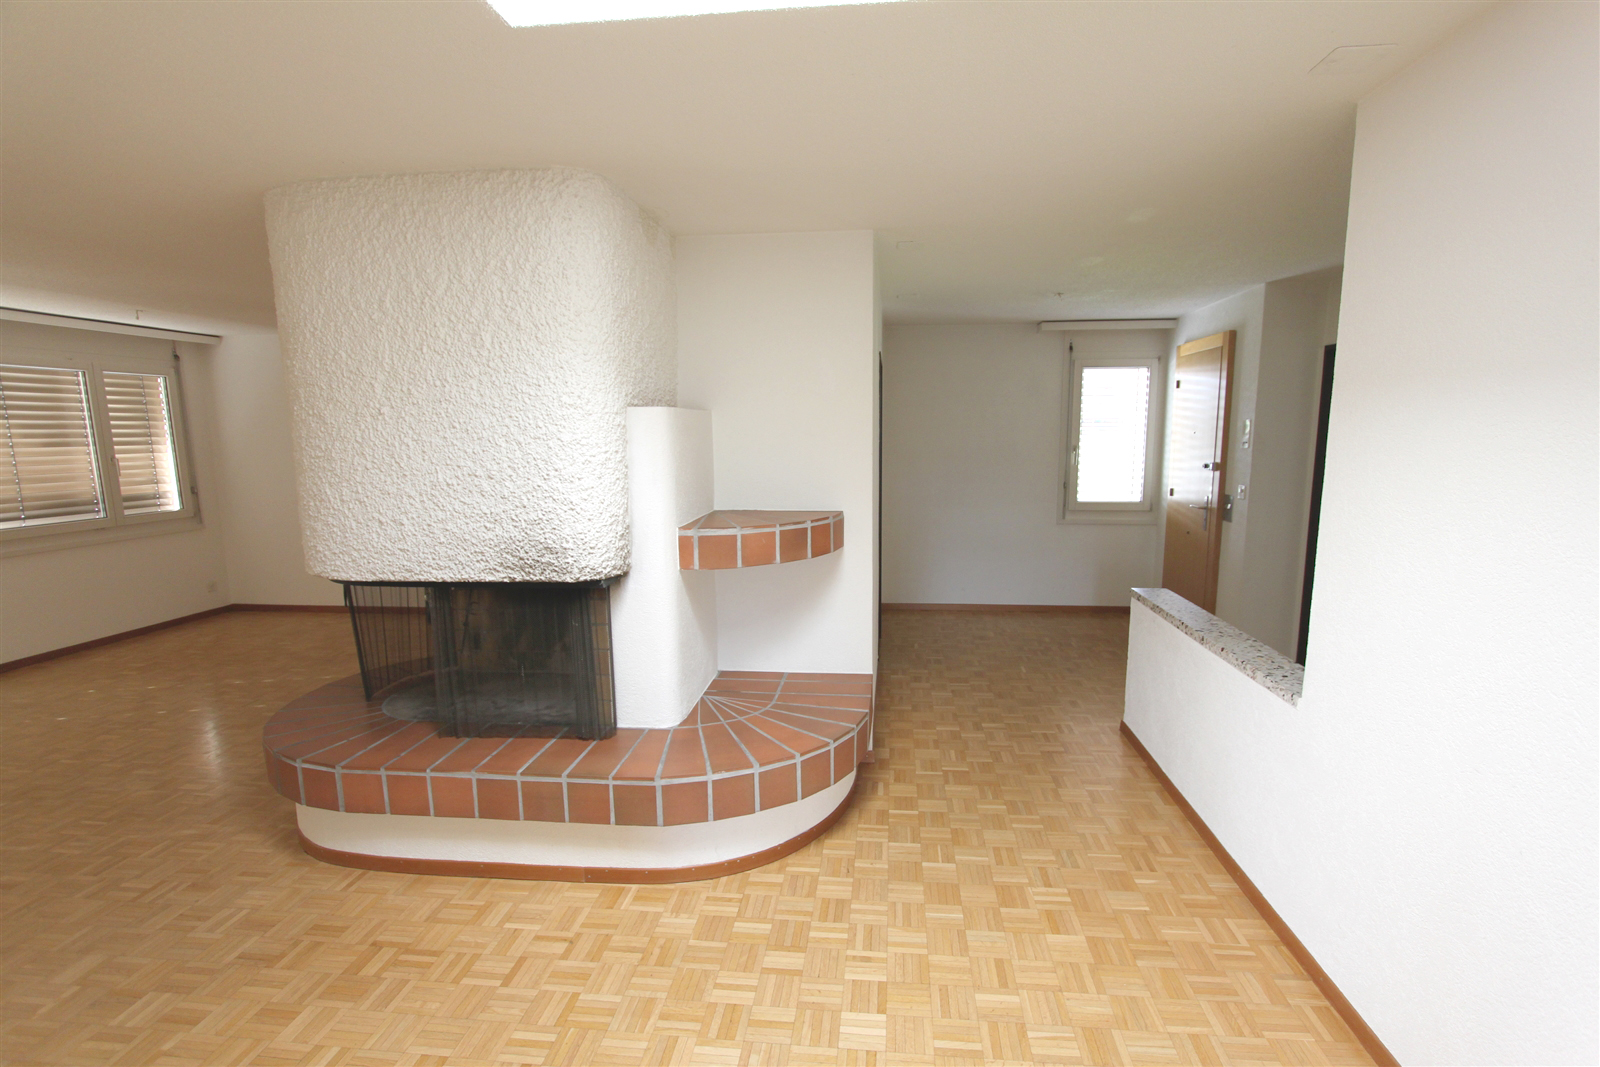 03 Interior Rosenhalde - 004